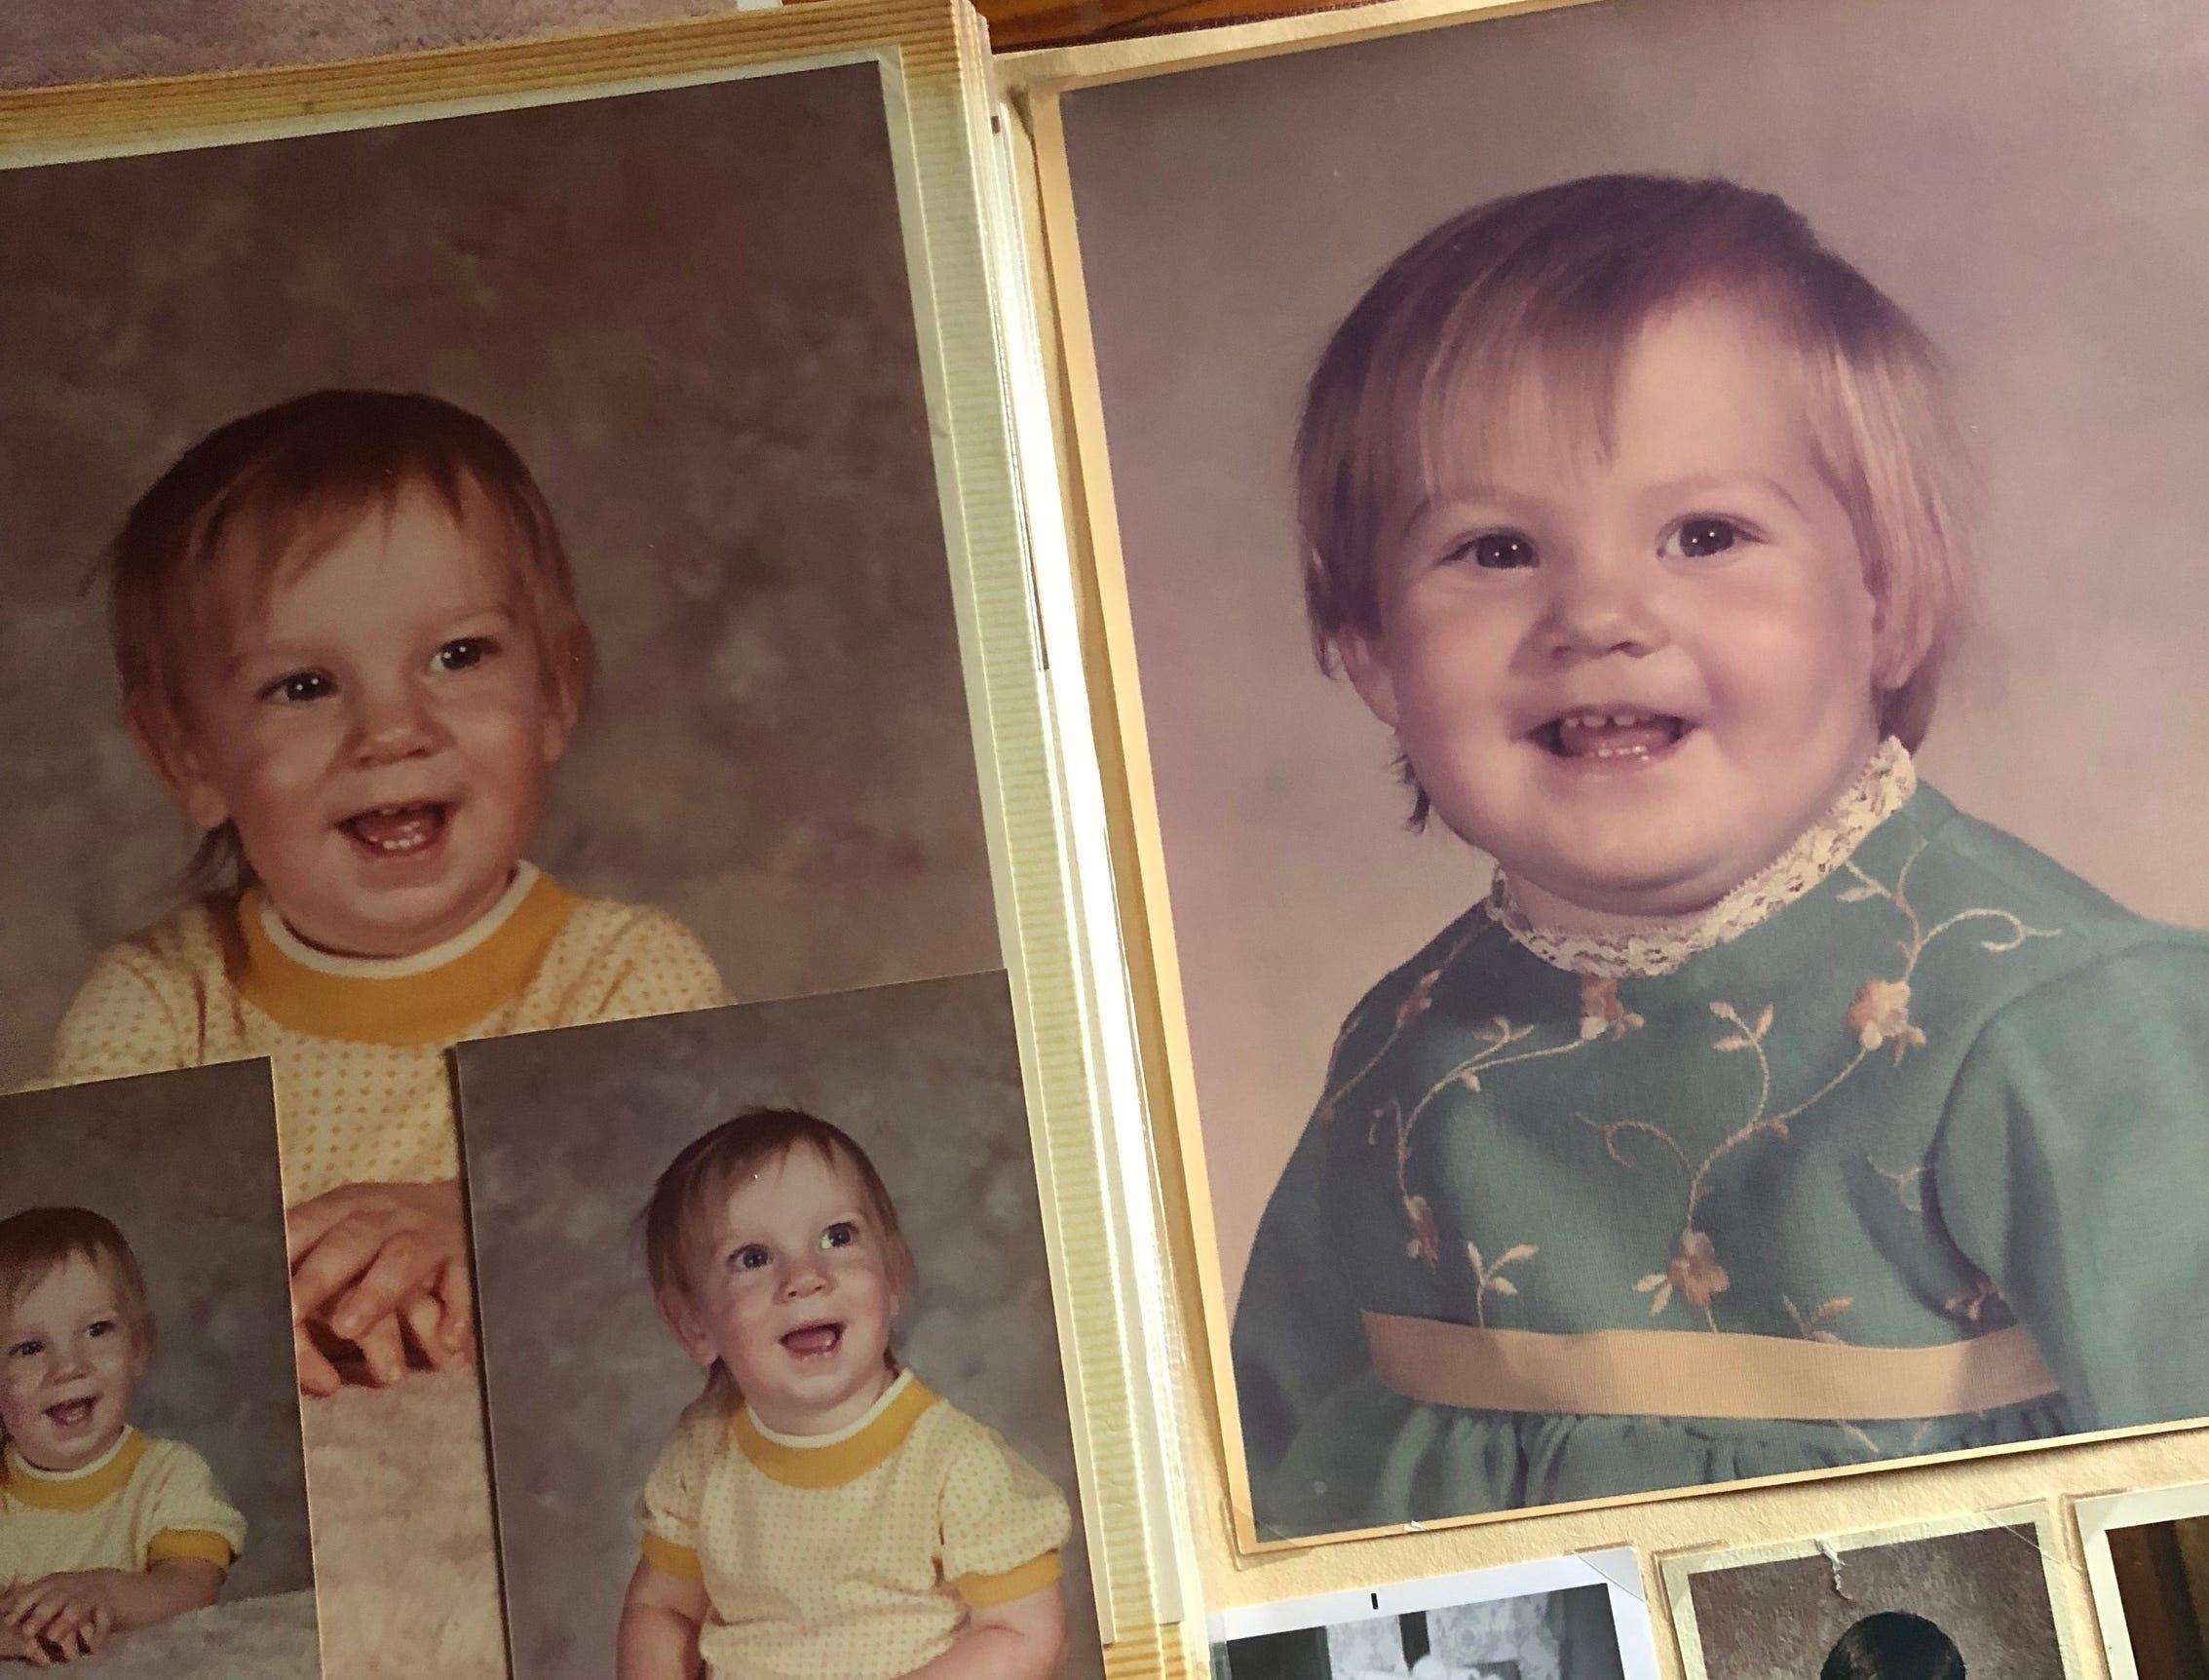 Scott Jackowski, left, and his sister, Lori Hoban, as babies.